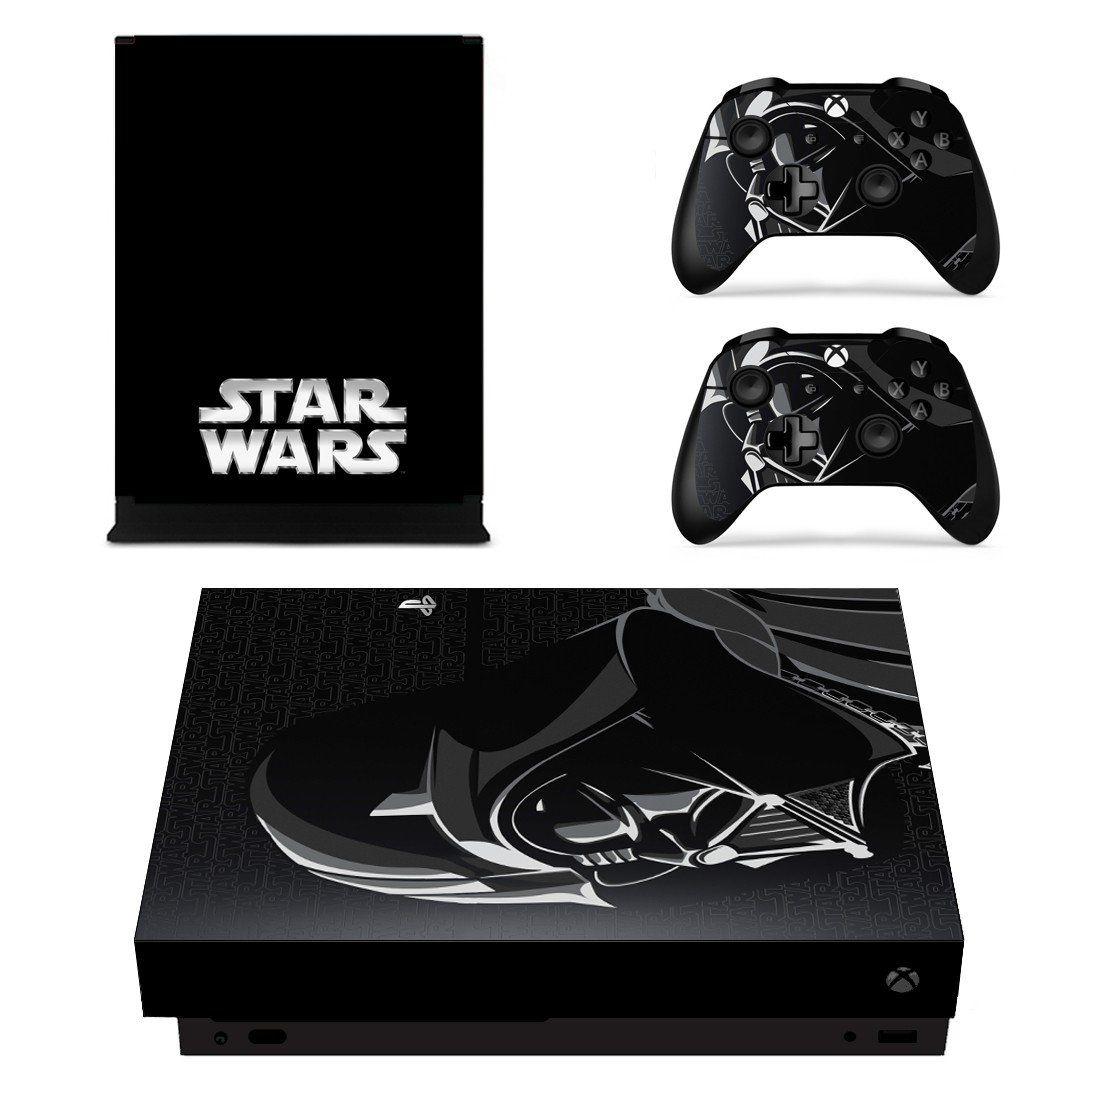 Star Wars xbox one X skin decal